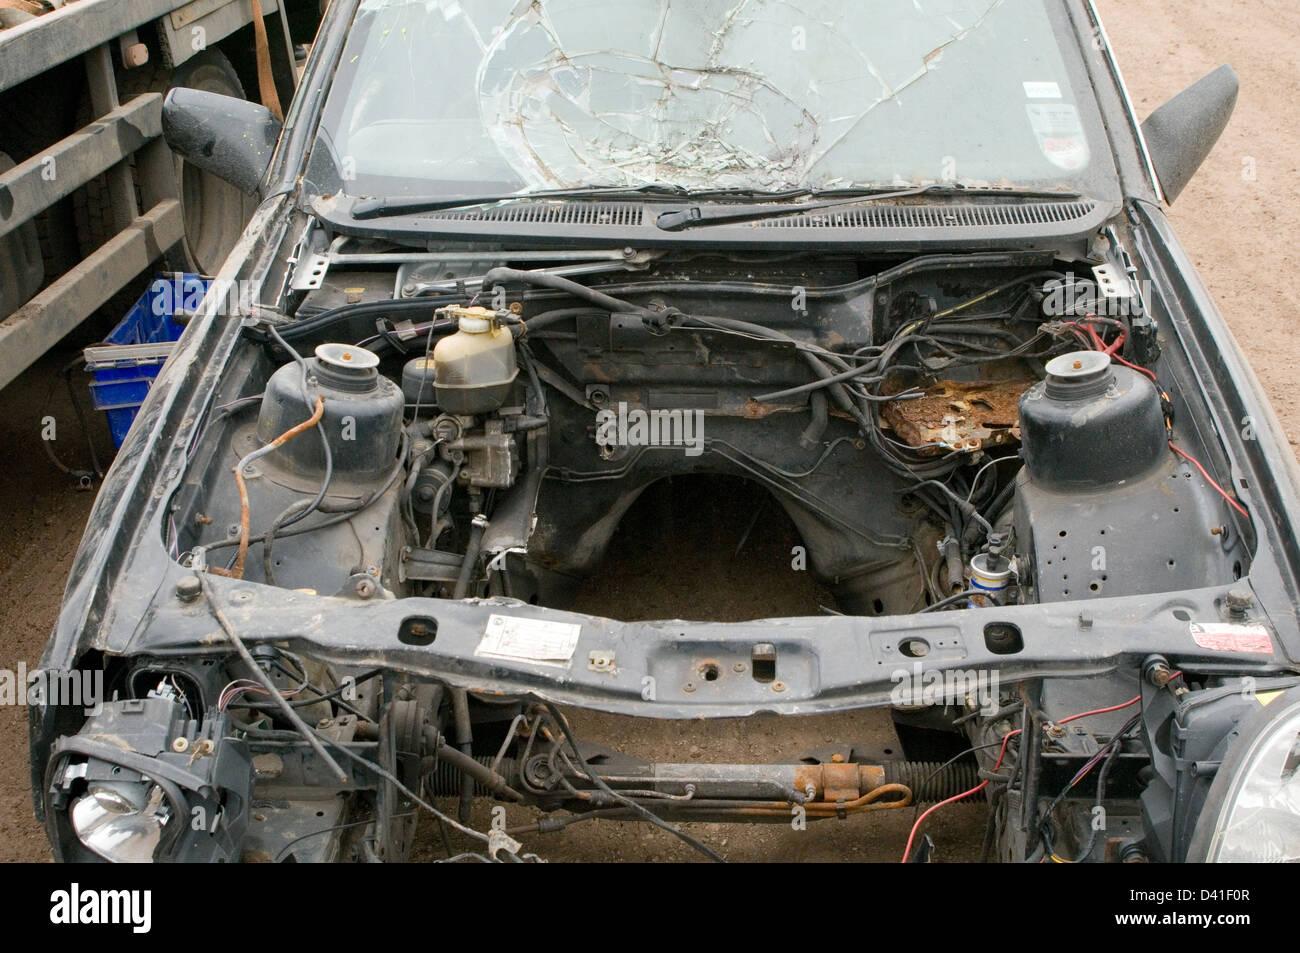 Engine Removed Stockfotos & Engine Removed Bilder - Alamy